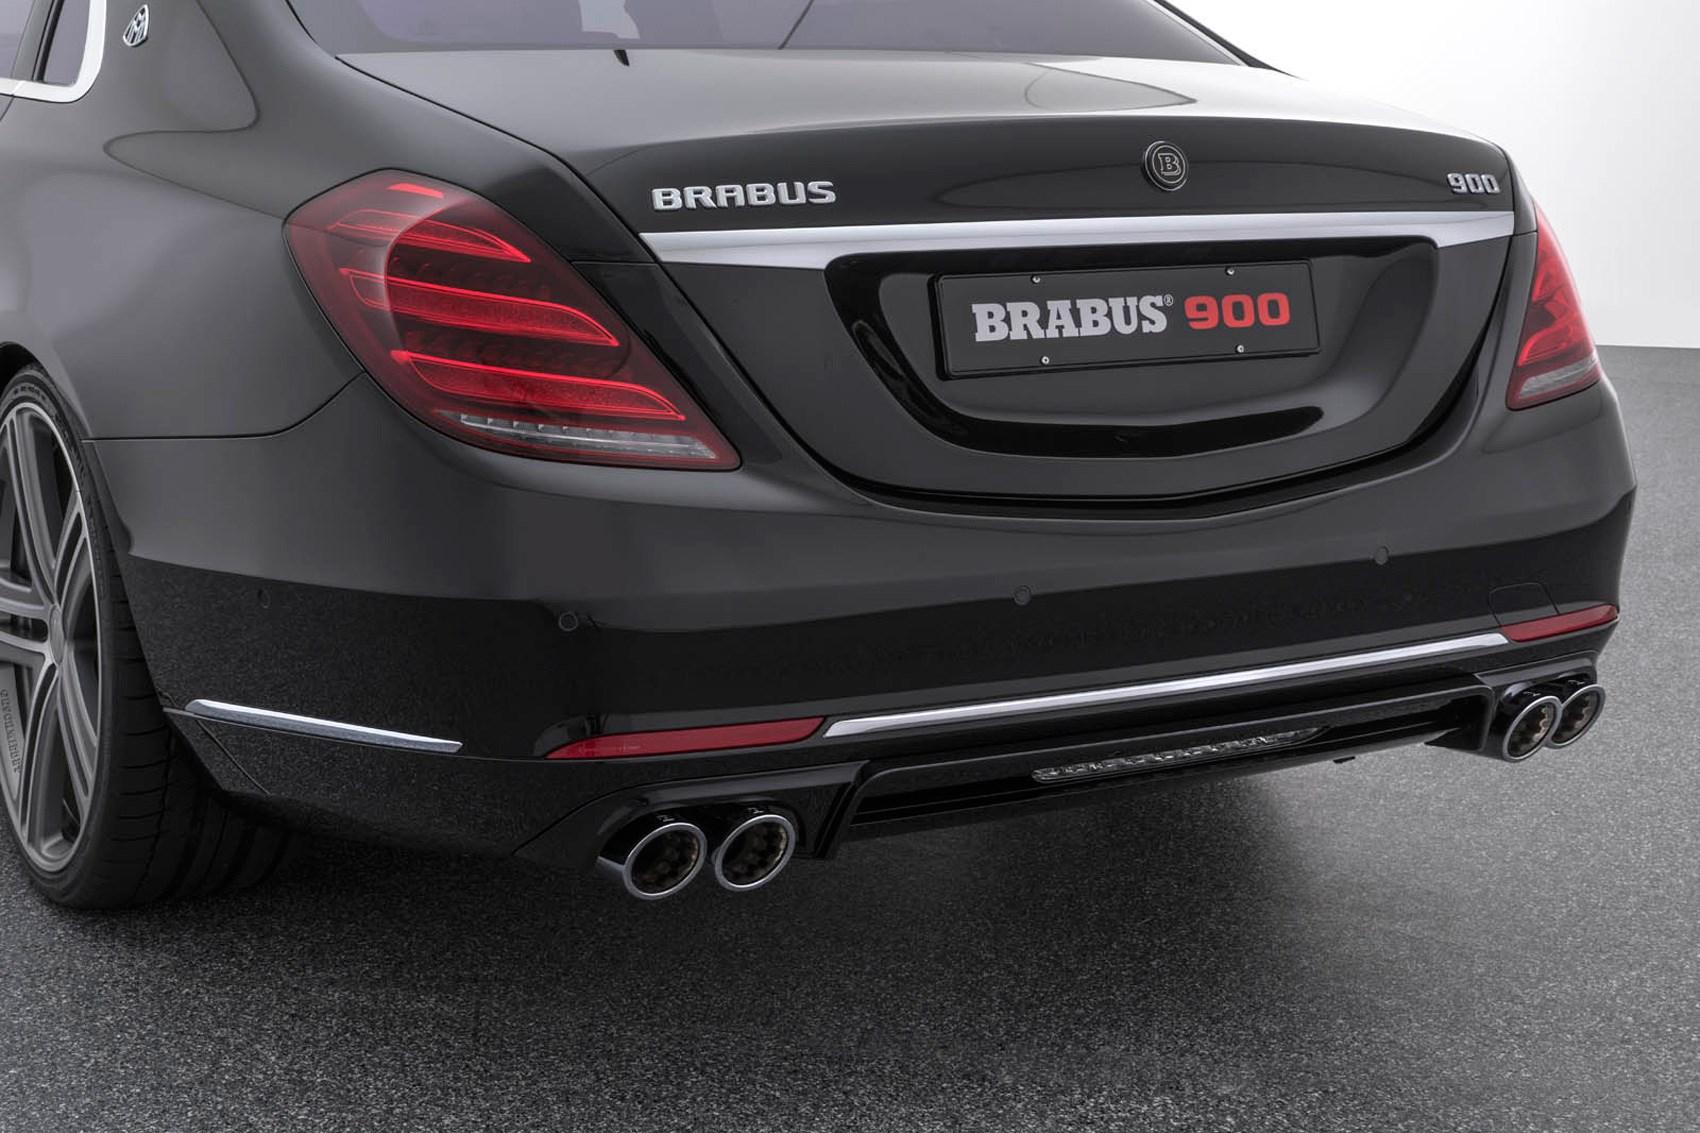 Mercedes Benz Brabus >> Demonic Limo Mercedes S Class Facelift Gets 888bhp Brabus